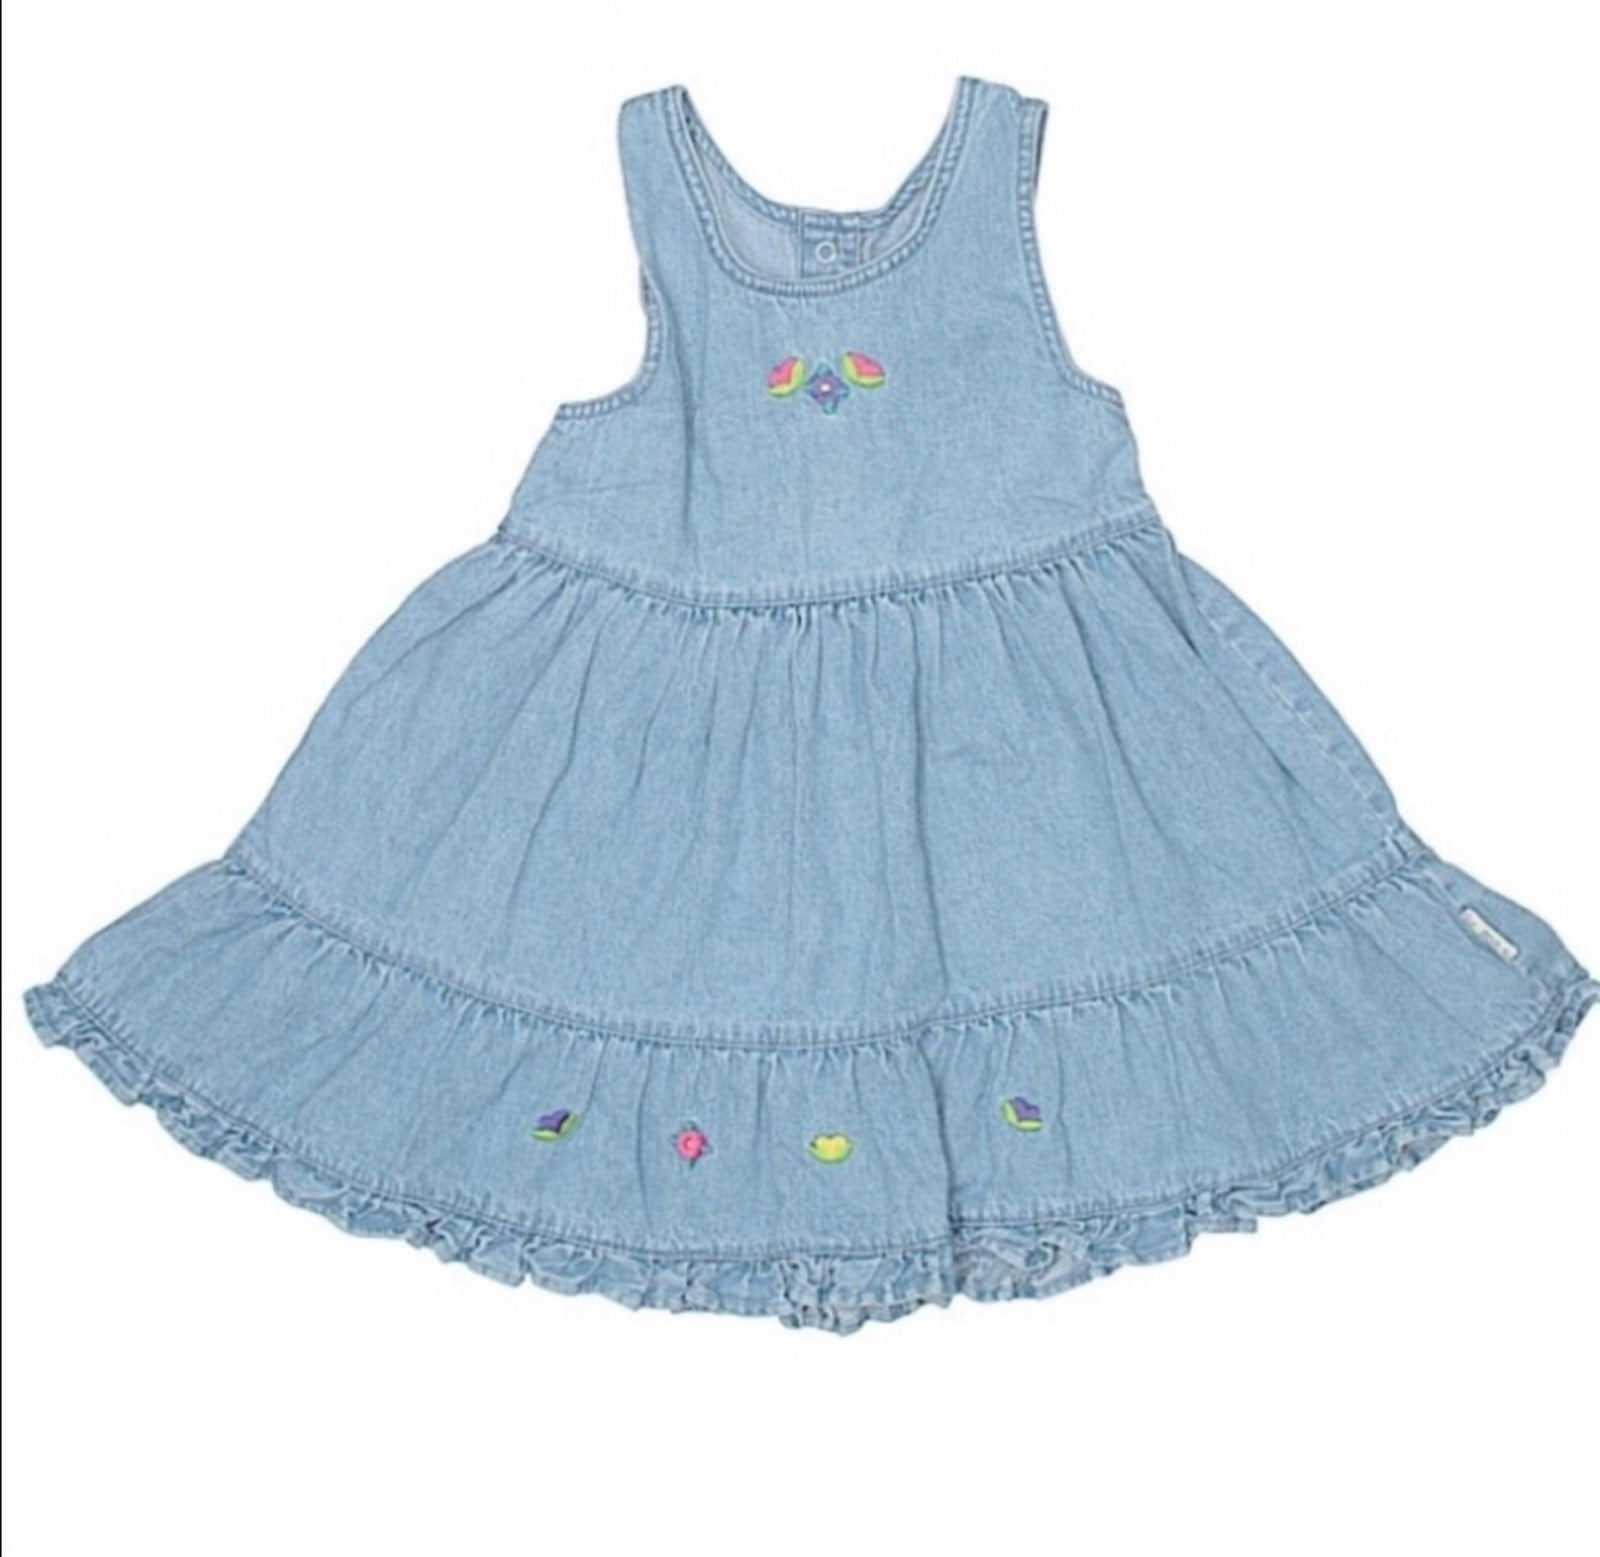 Vintage Gymboree Denim Ruffled Dress L